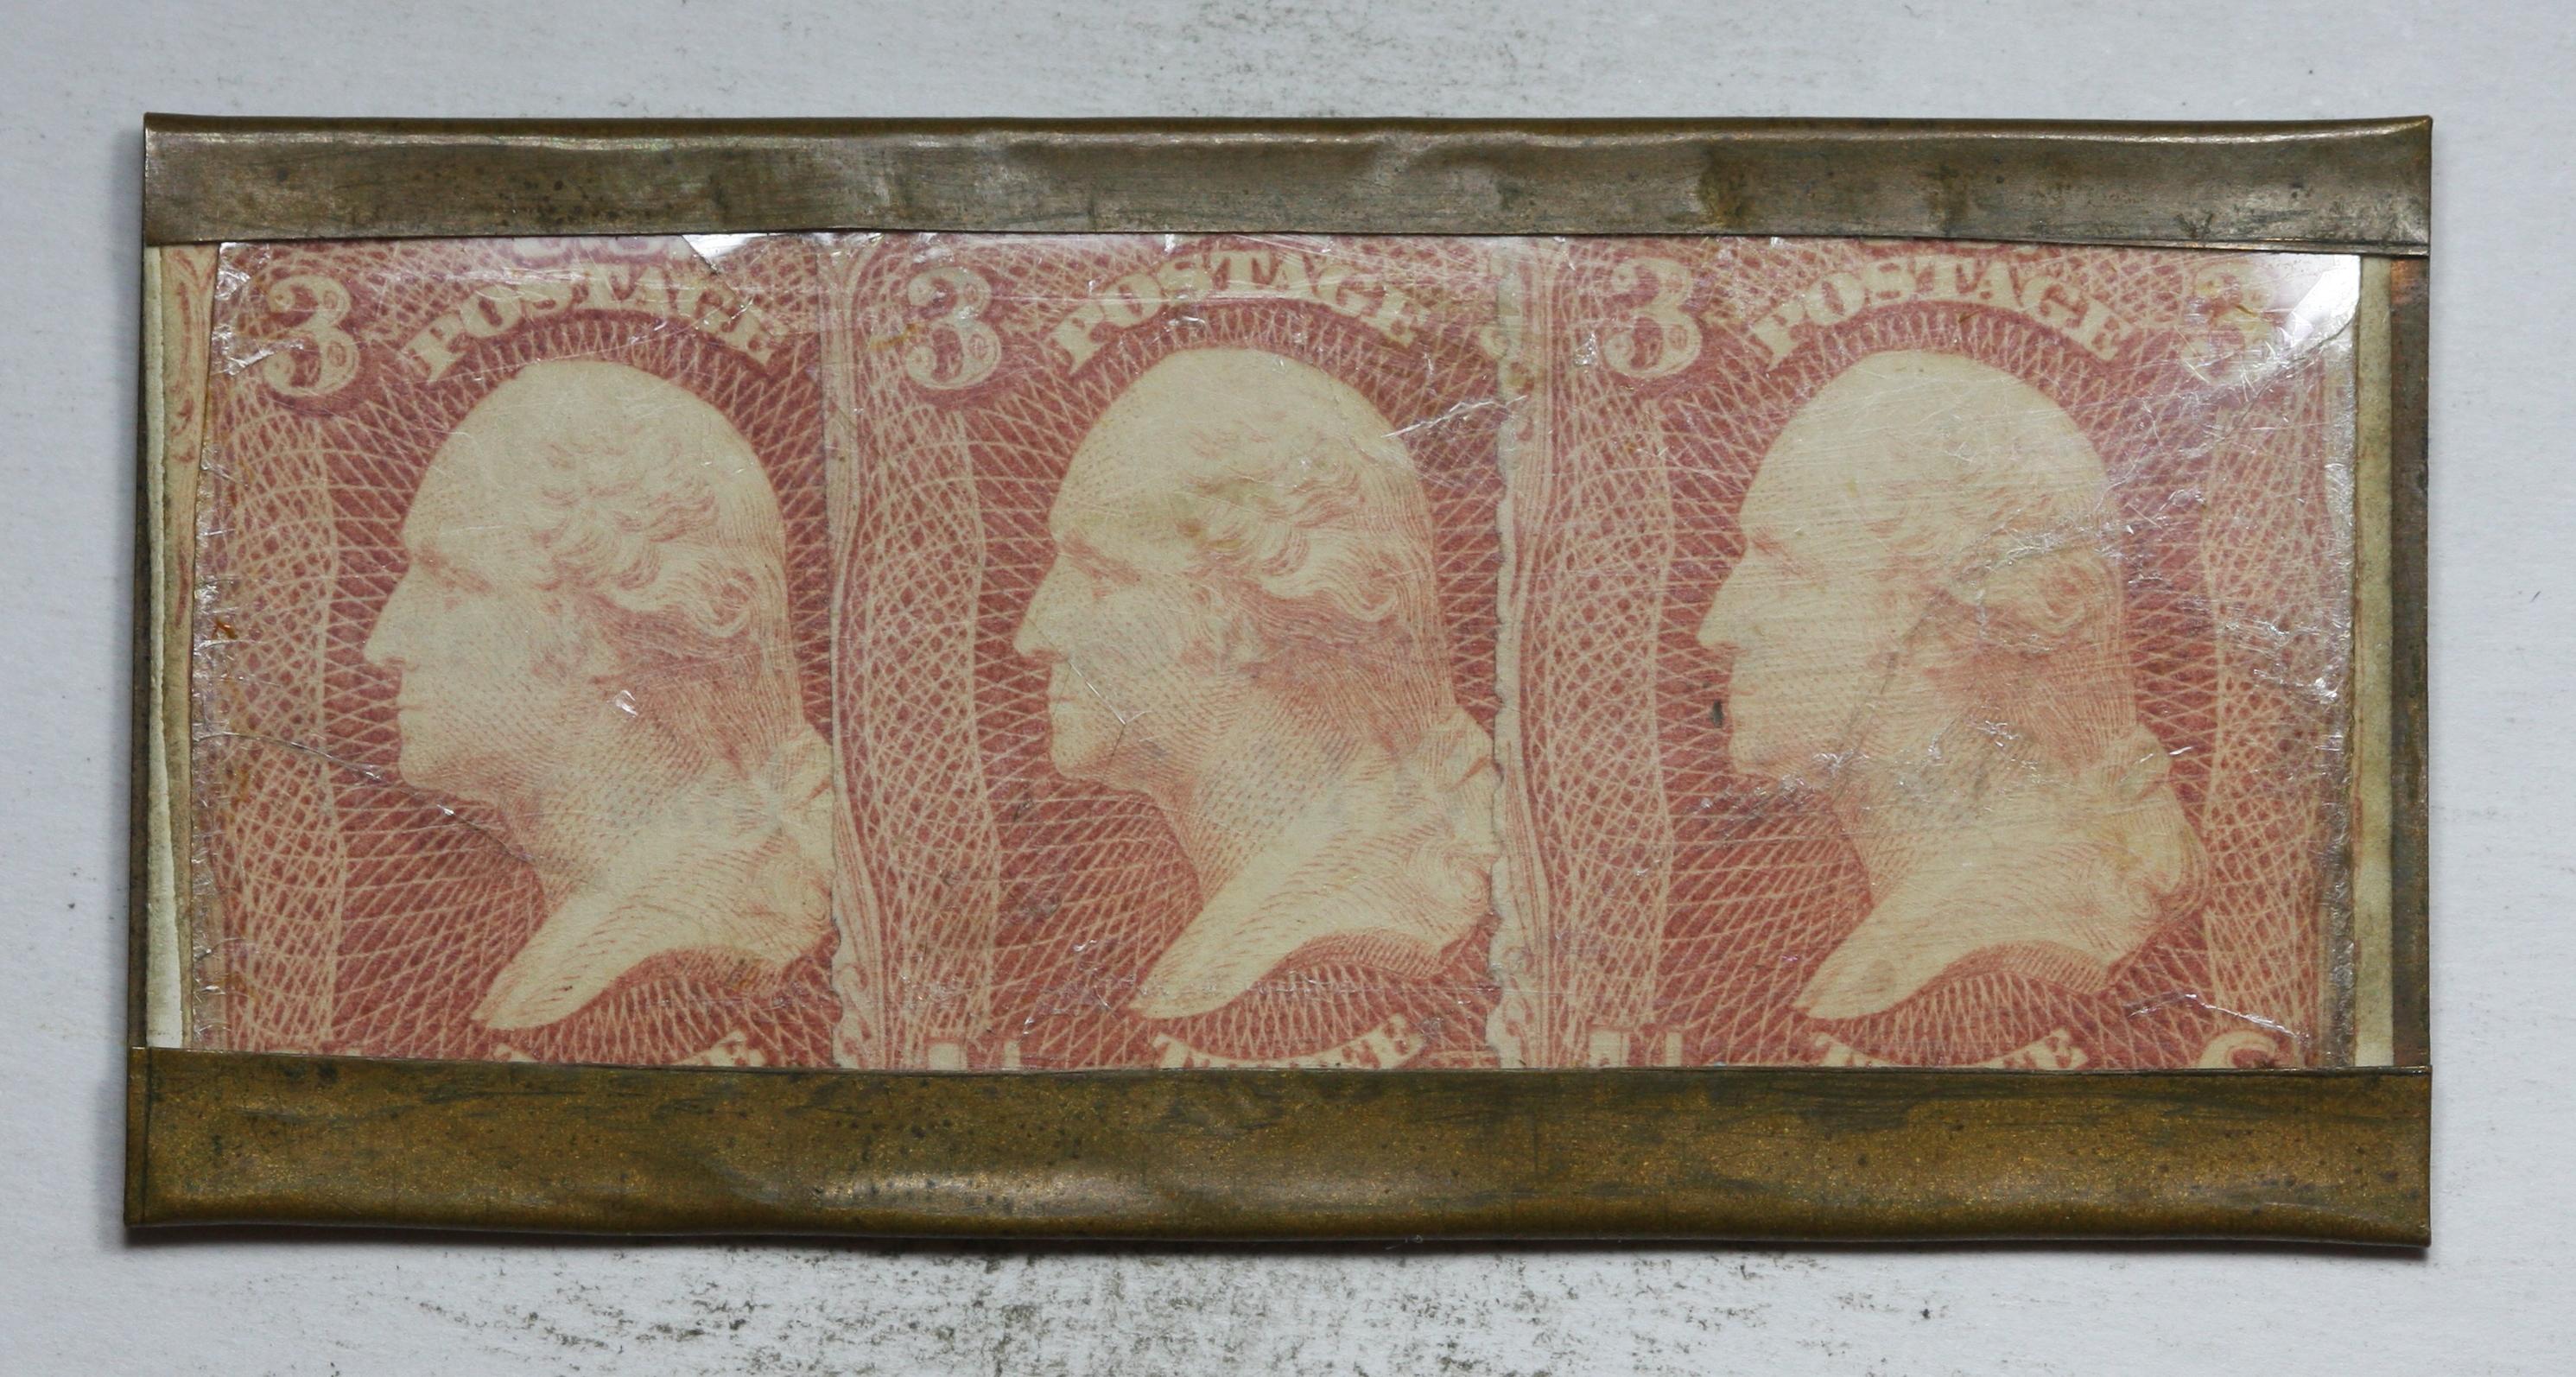 1890's 9 Cent Encased Postage Feuchtwangers Design